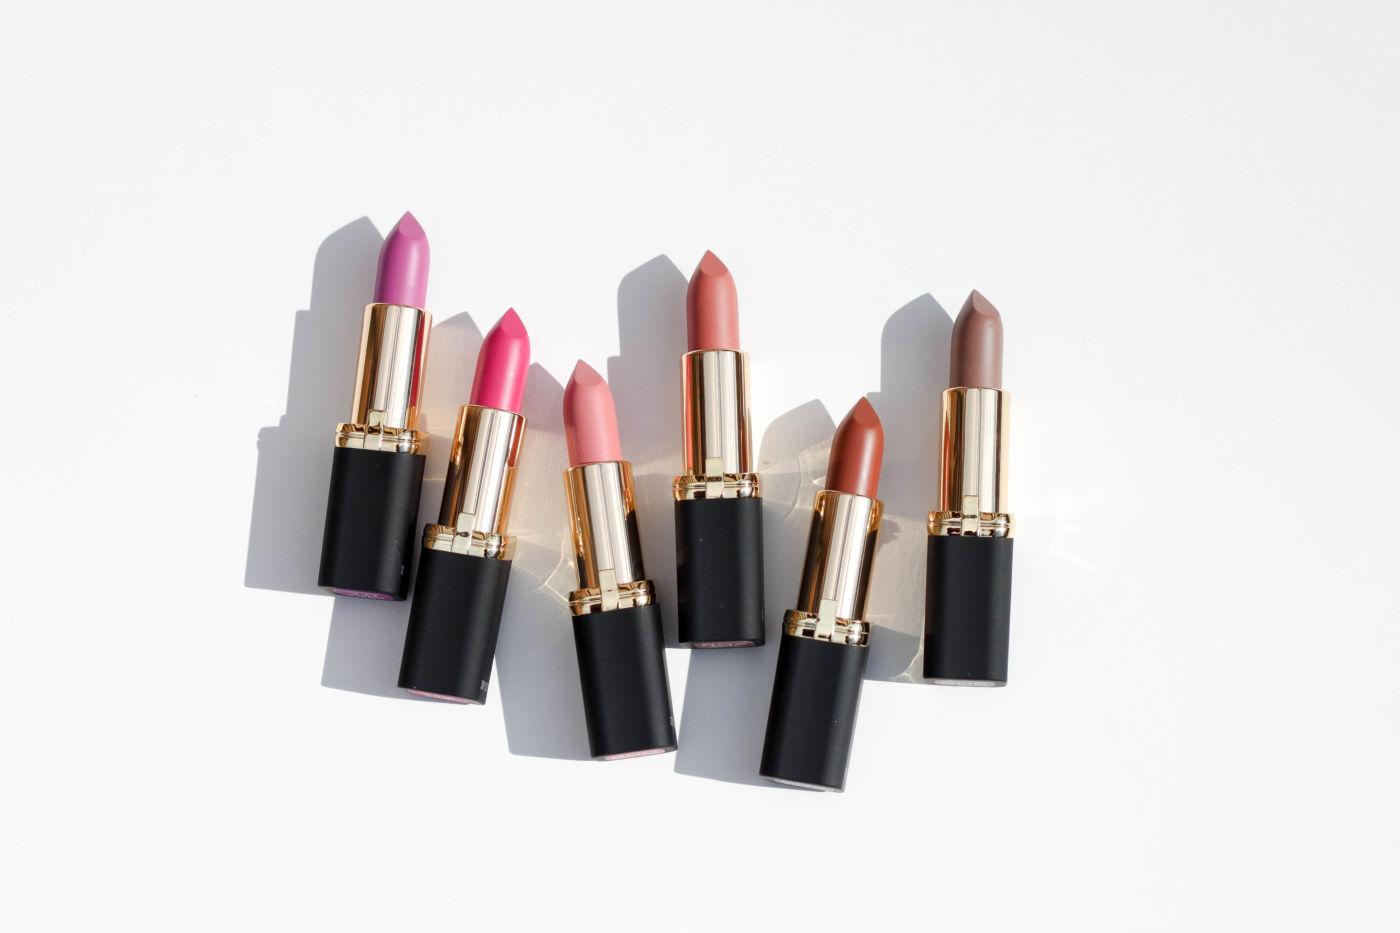 l'oreal paris colour riche matte lipstick, matte lipstick, matte drugstore lipstick, best matte lipsticks, new matte l'oreal lipstick, l'oreal matte lipstick shades, l'oreal matte lipstick swatches, best matte lisptick swatches, l'oreal colour riche matte swatches, matte-ly in love swatch, devil's matte-vocate swatch, matte-traction red, doesn't matte-r, matte-moiselle pink, matte-jestic, at the drop of the matte, matte-mandate, matte-caron, matte-sterpiece, he thinks he's matte-cho, matte-itude, matte red lipstick, matte pink lipstick, matte nude lipstick